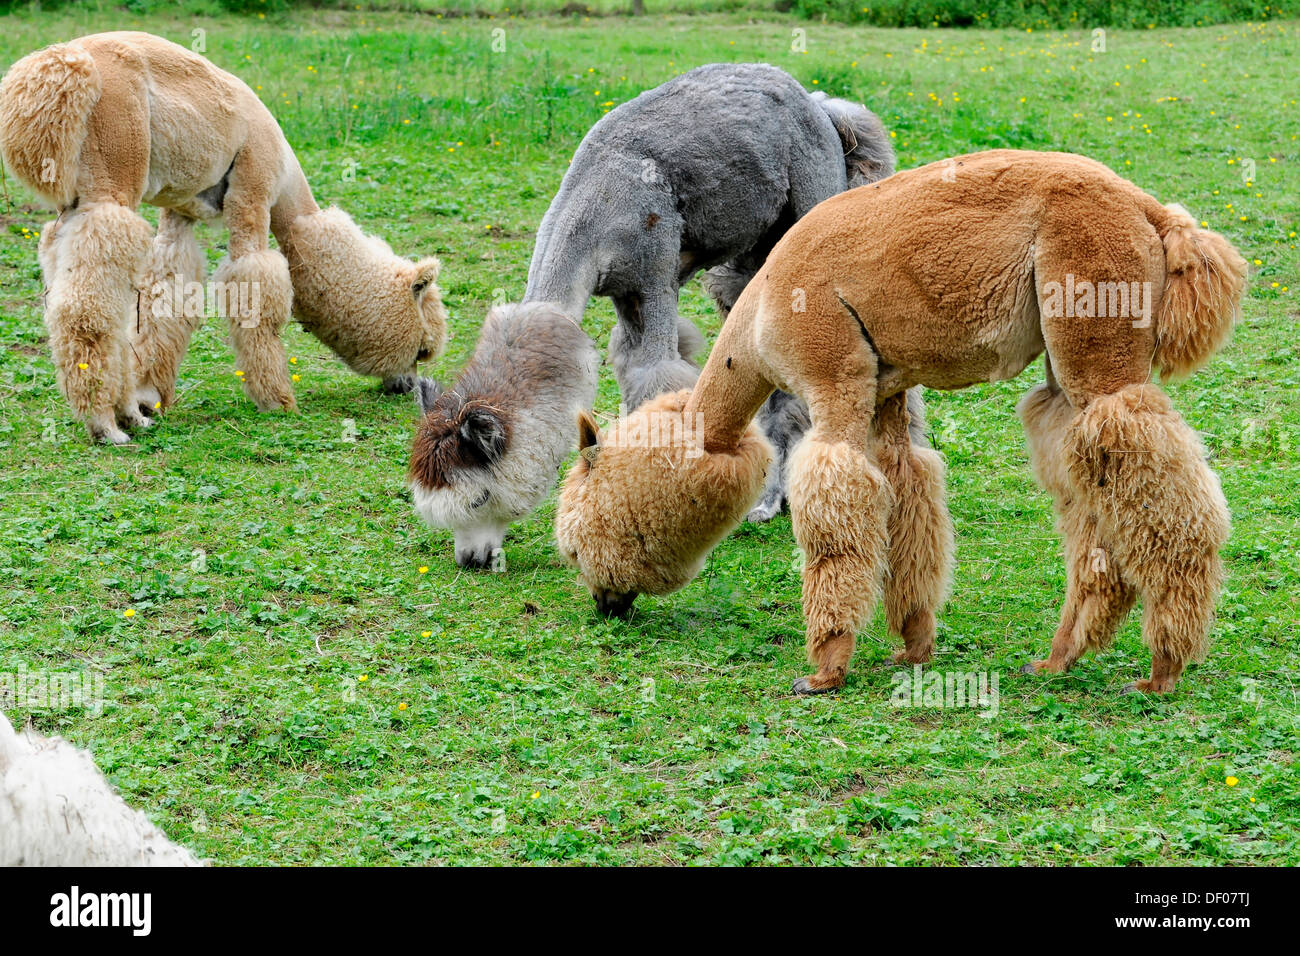 Alpacas (Lama pacos), alpaca breeding, Schwaebisch Gmuend, Baden-Wuerttemberg - Stock Image